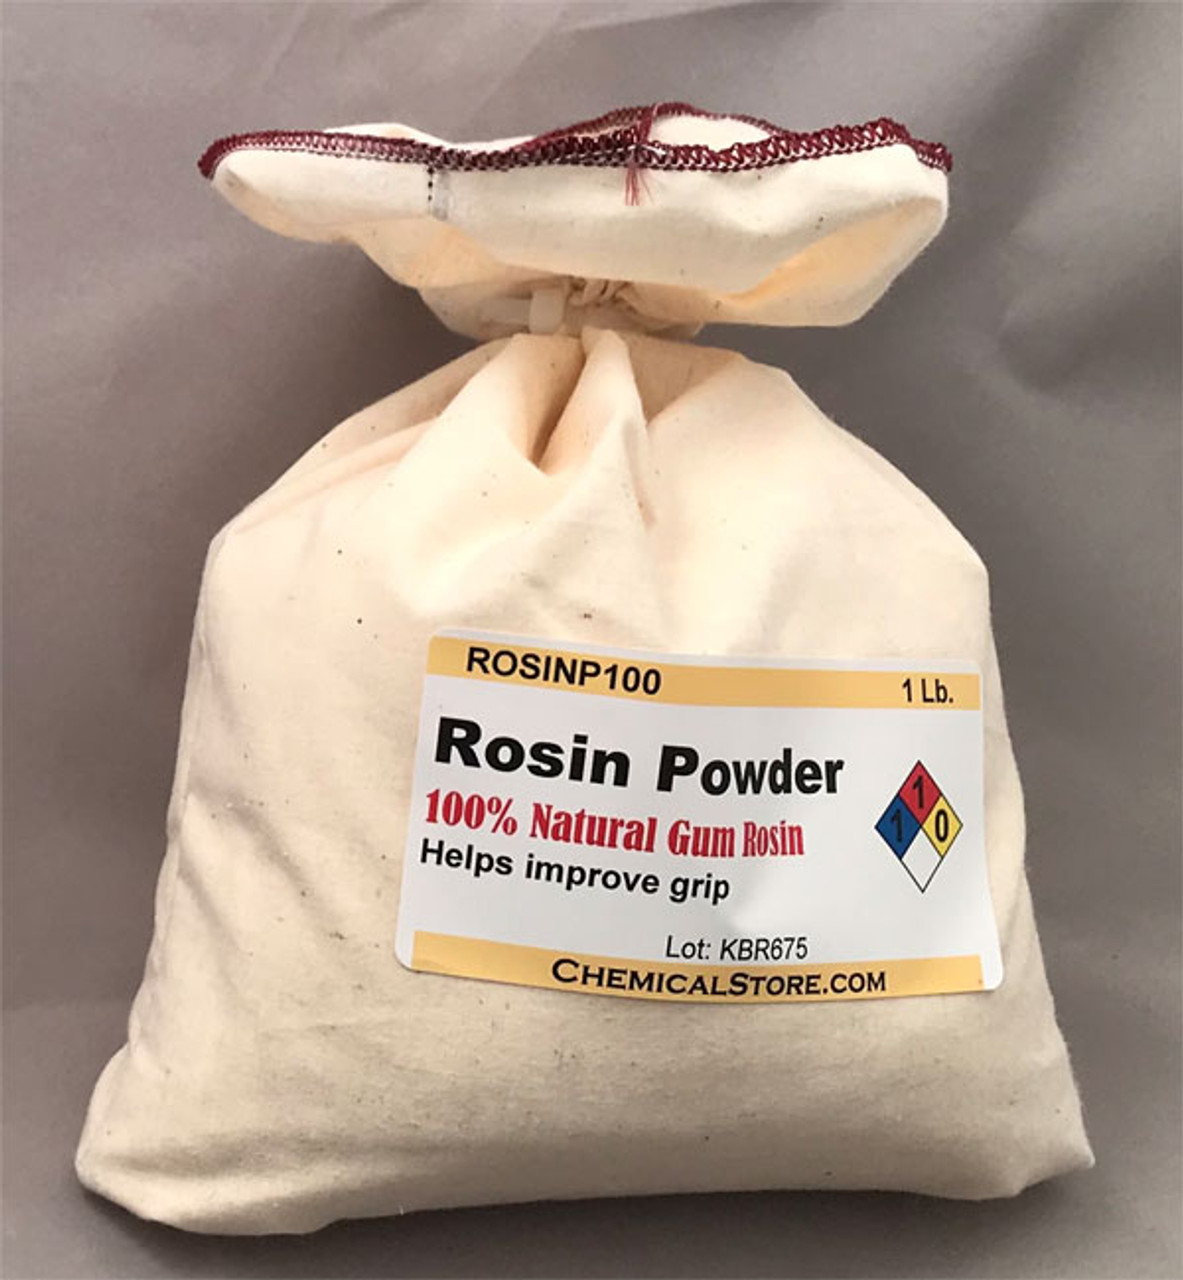 Natural Rosin Powder in cotton bag